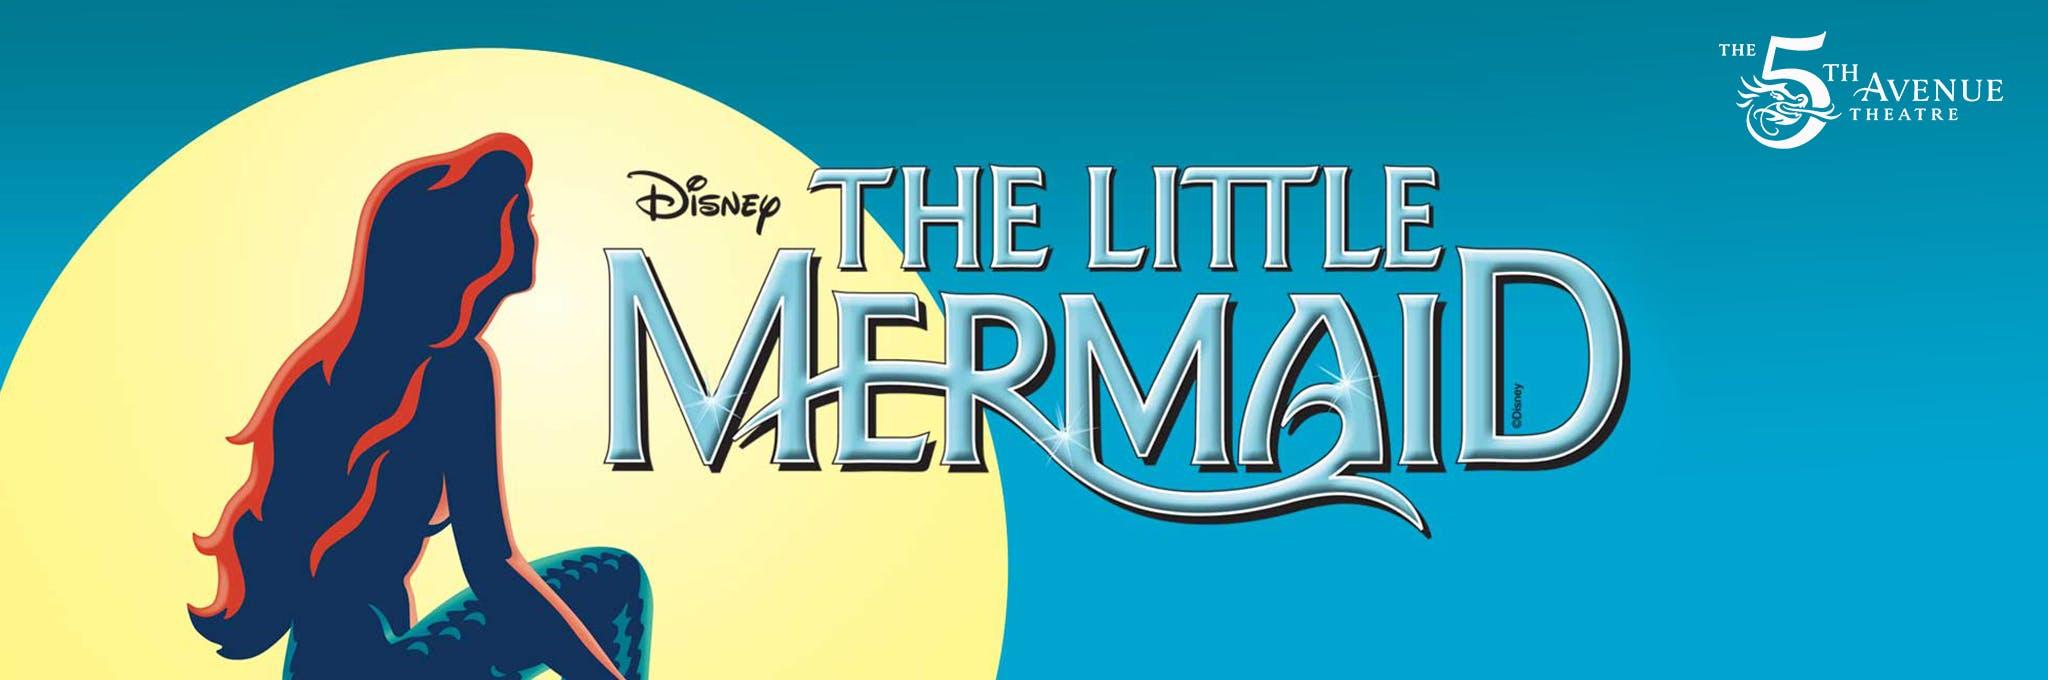 The Little Mermaid Logo